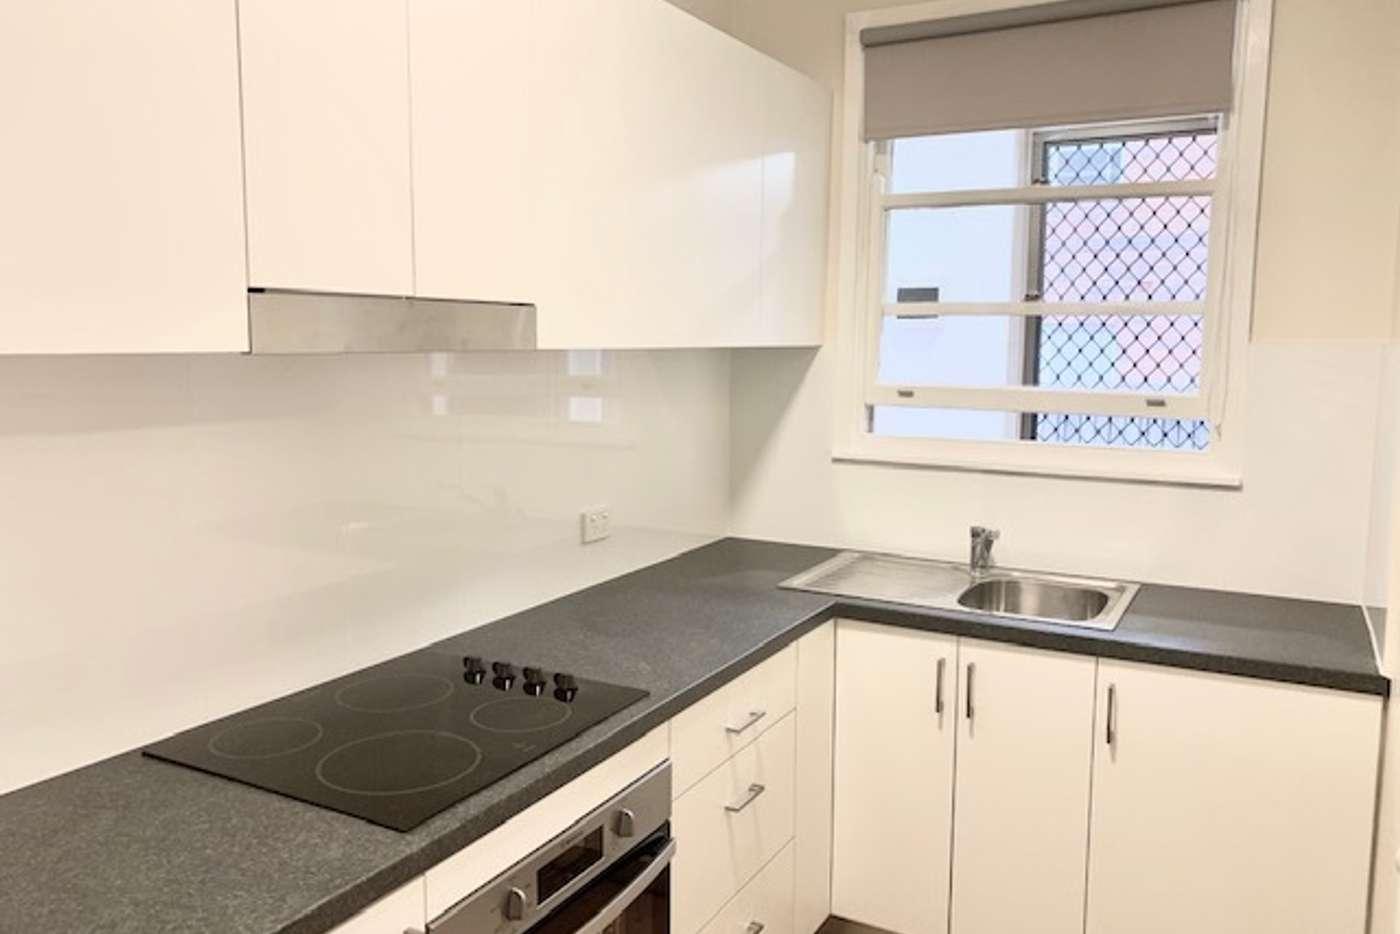 Main view of Homely apartment listing, 4/49 Thomas Street, Ashfield NSW 2131